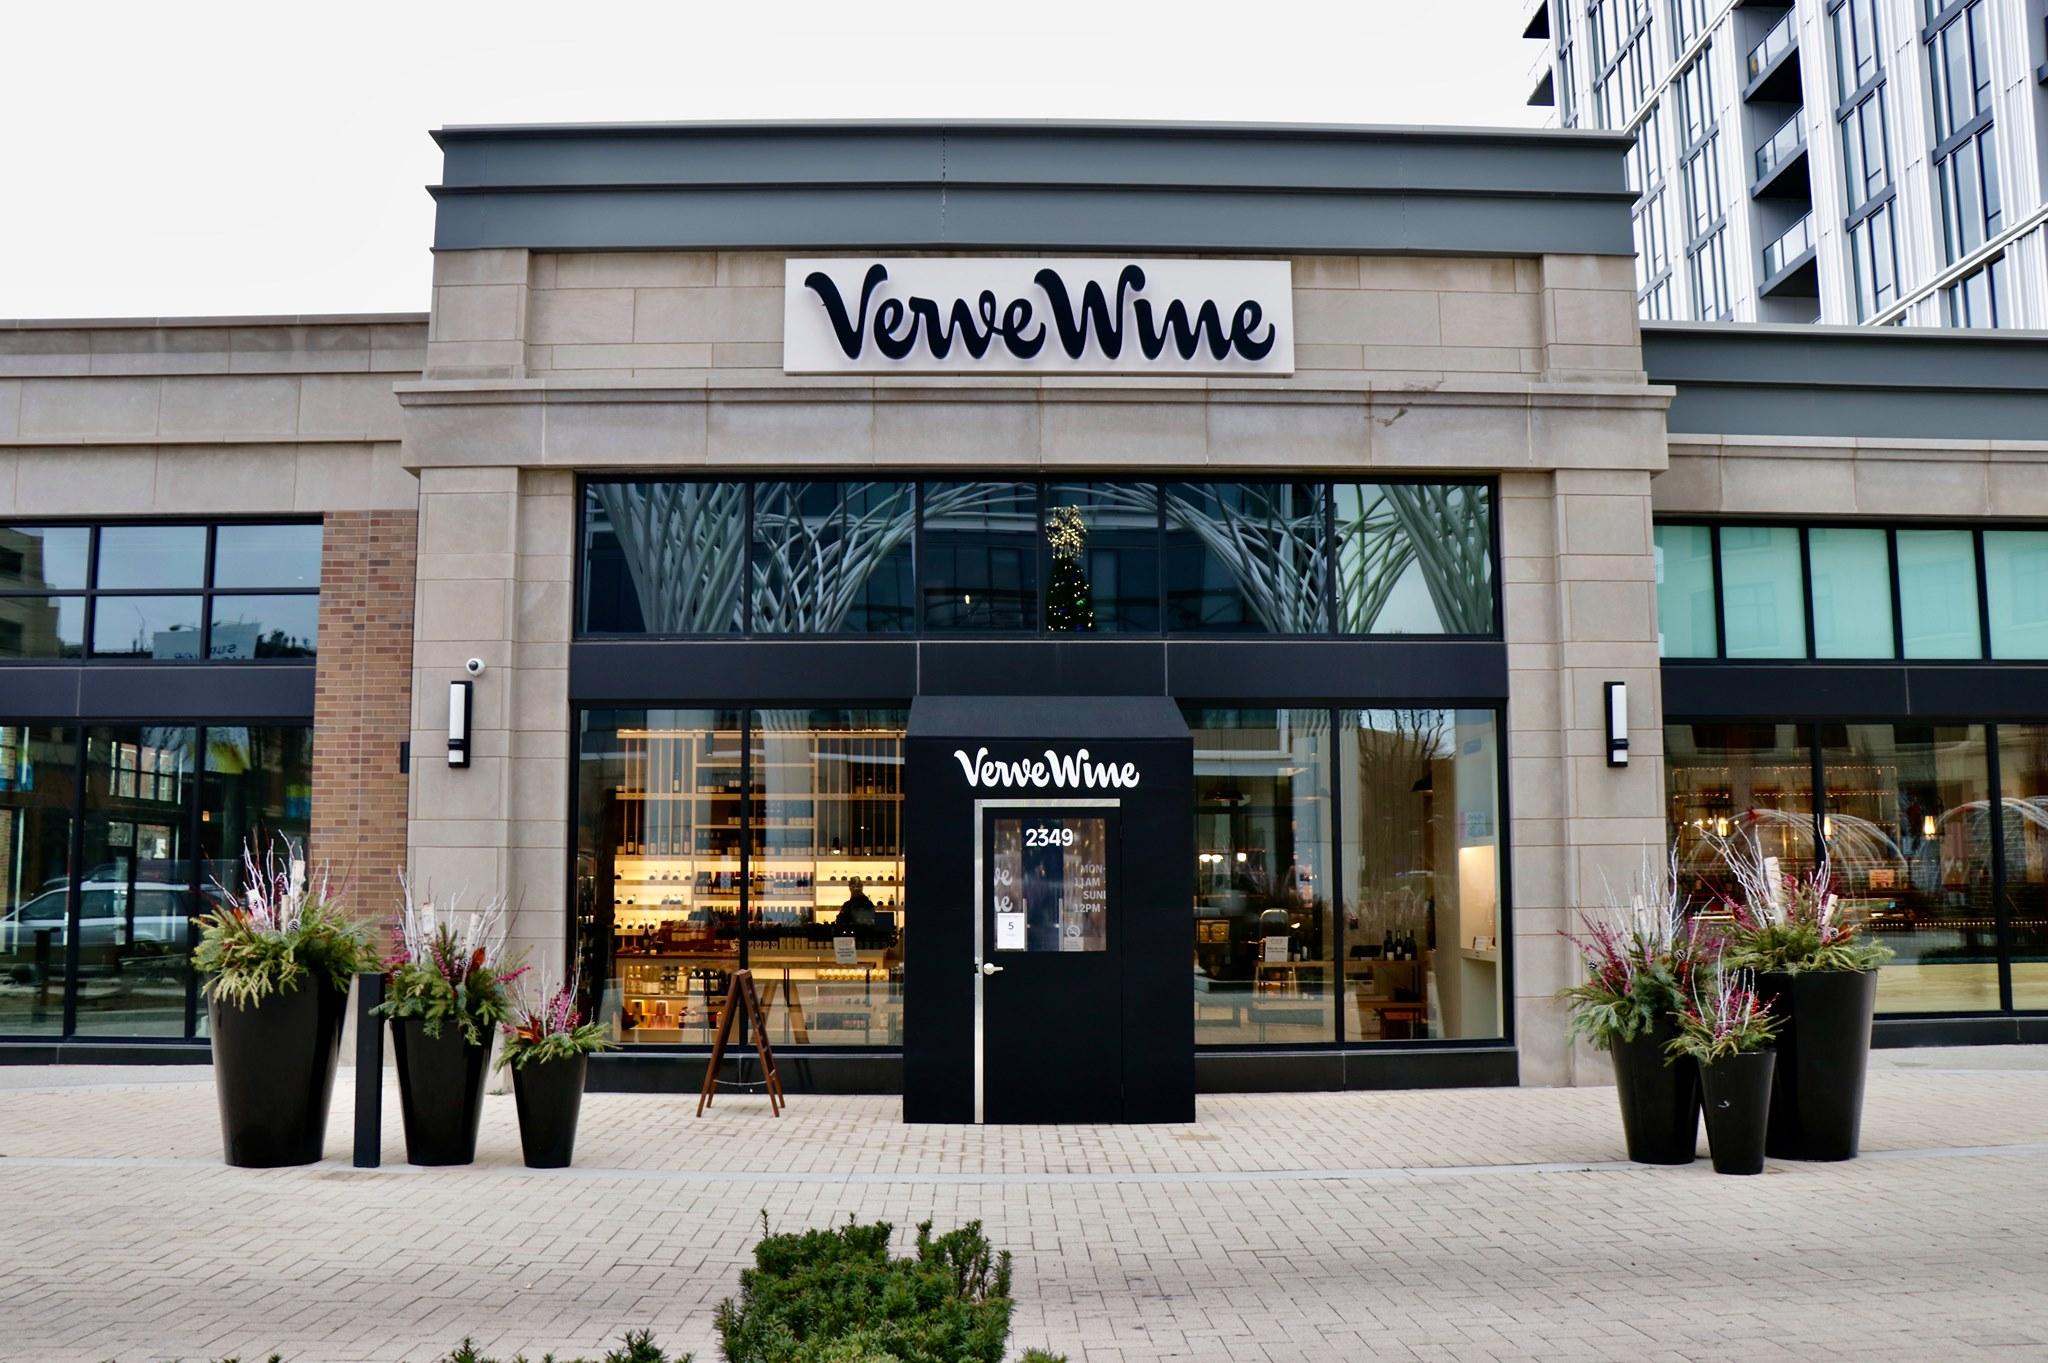 Verve Wine Chicago front